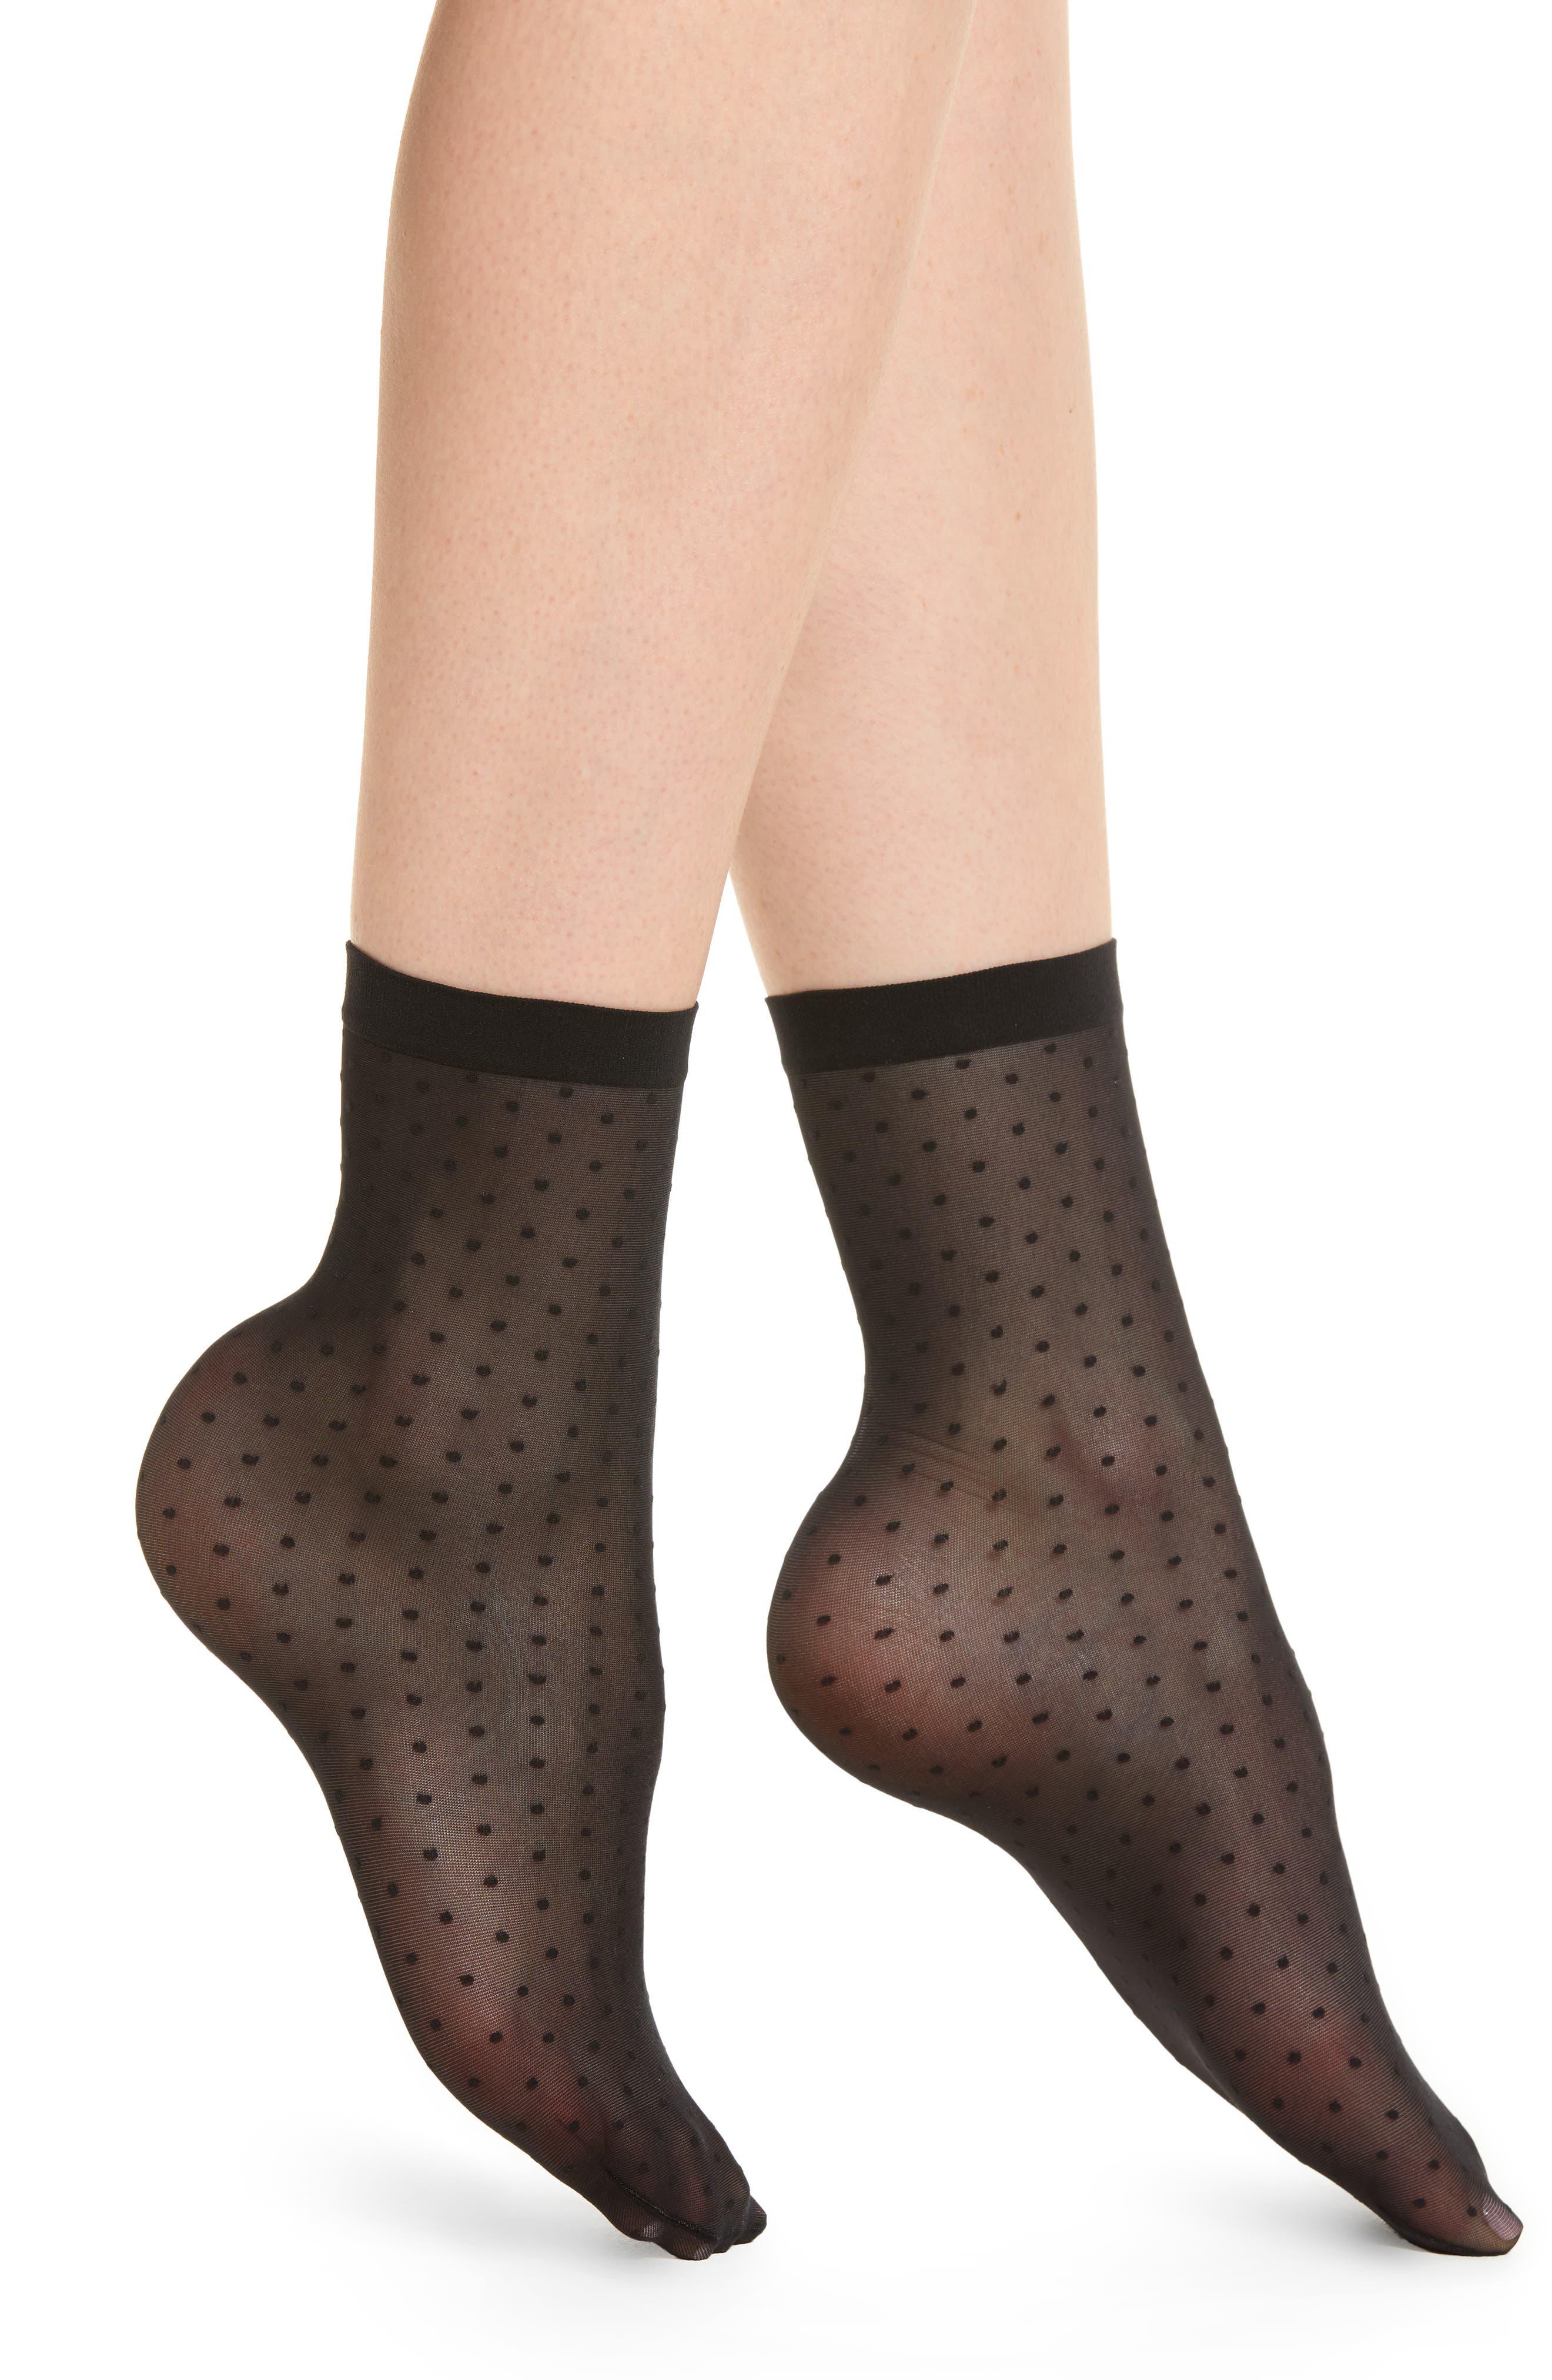 Sarah Jessica Sheer Socks,                             Main thumbnail 1, color,                             014